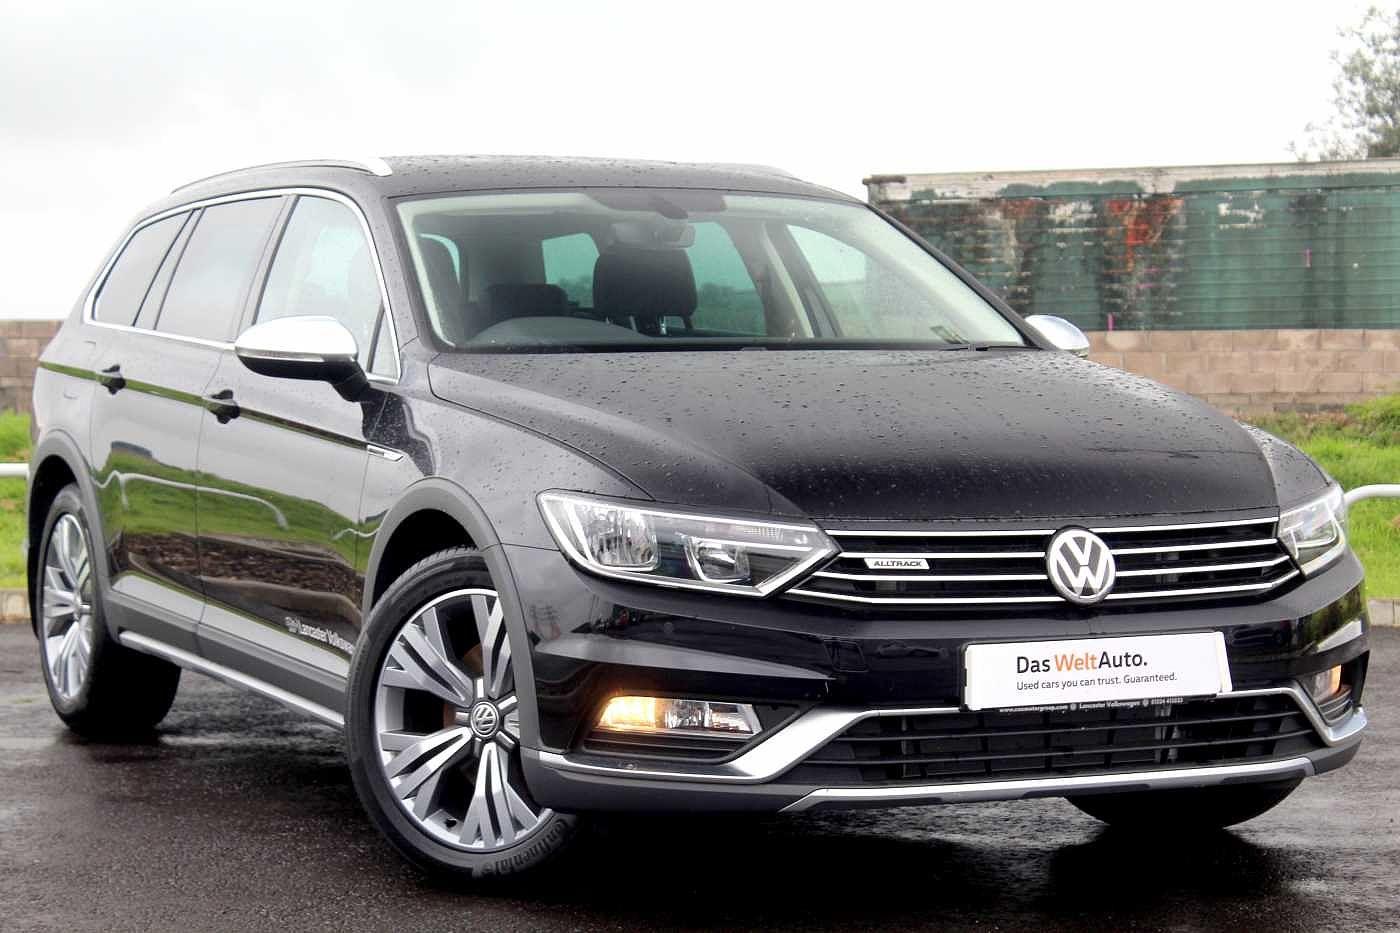 Volkswagen Passat Alltrack 2.0 TDI 150PS SCR 4MOTION